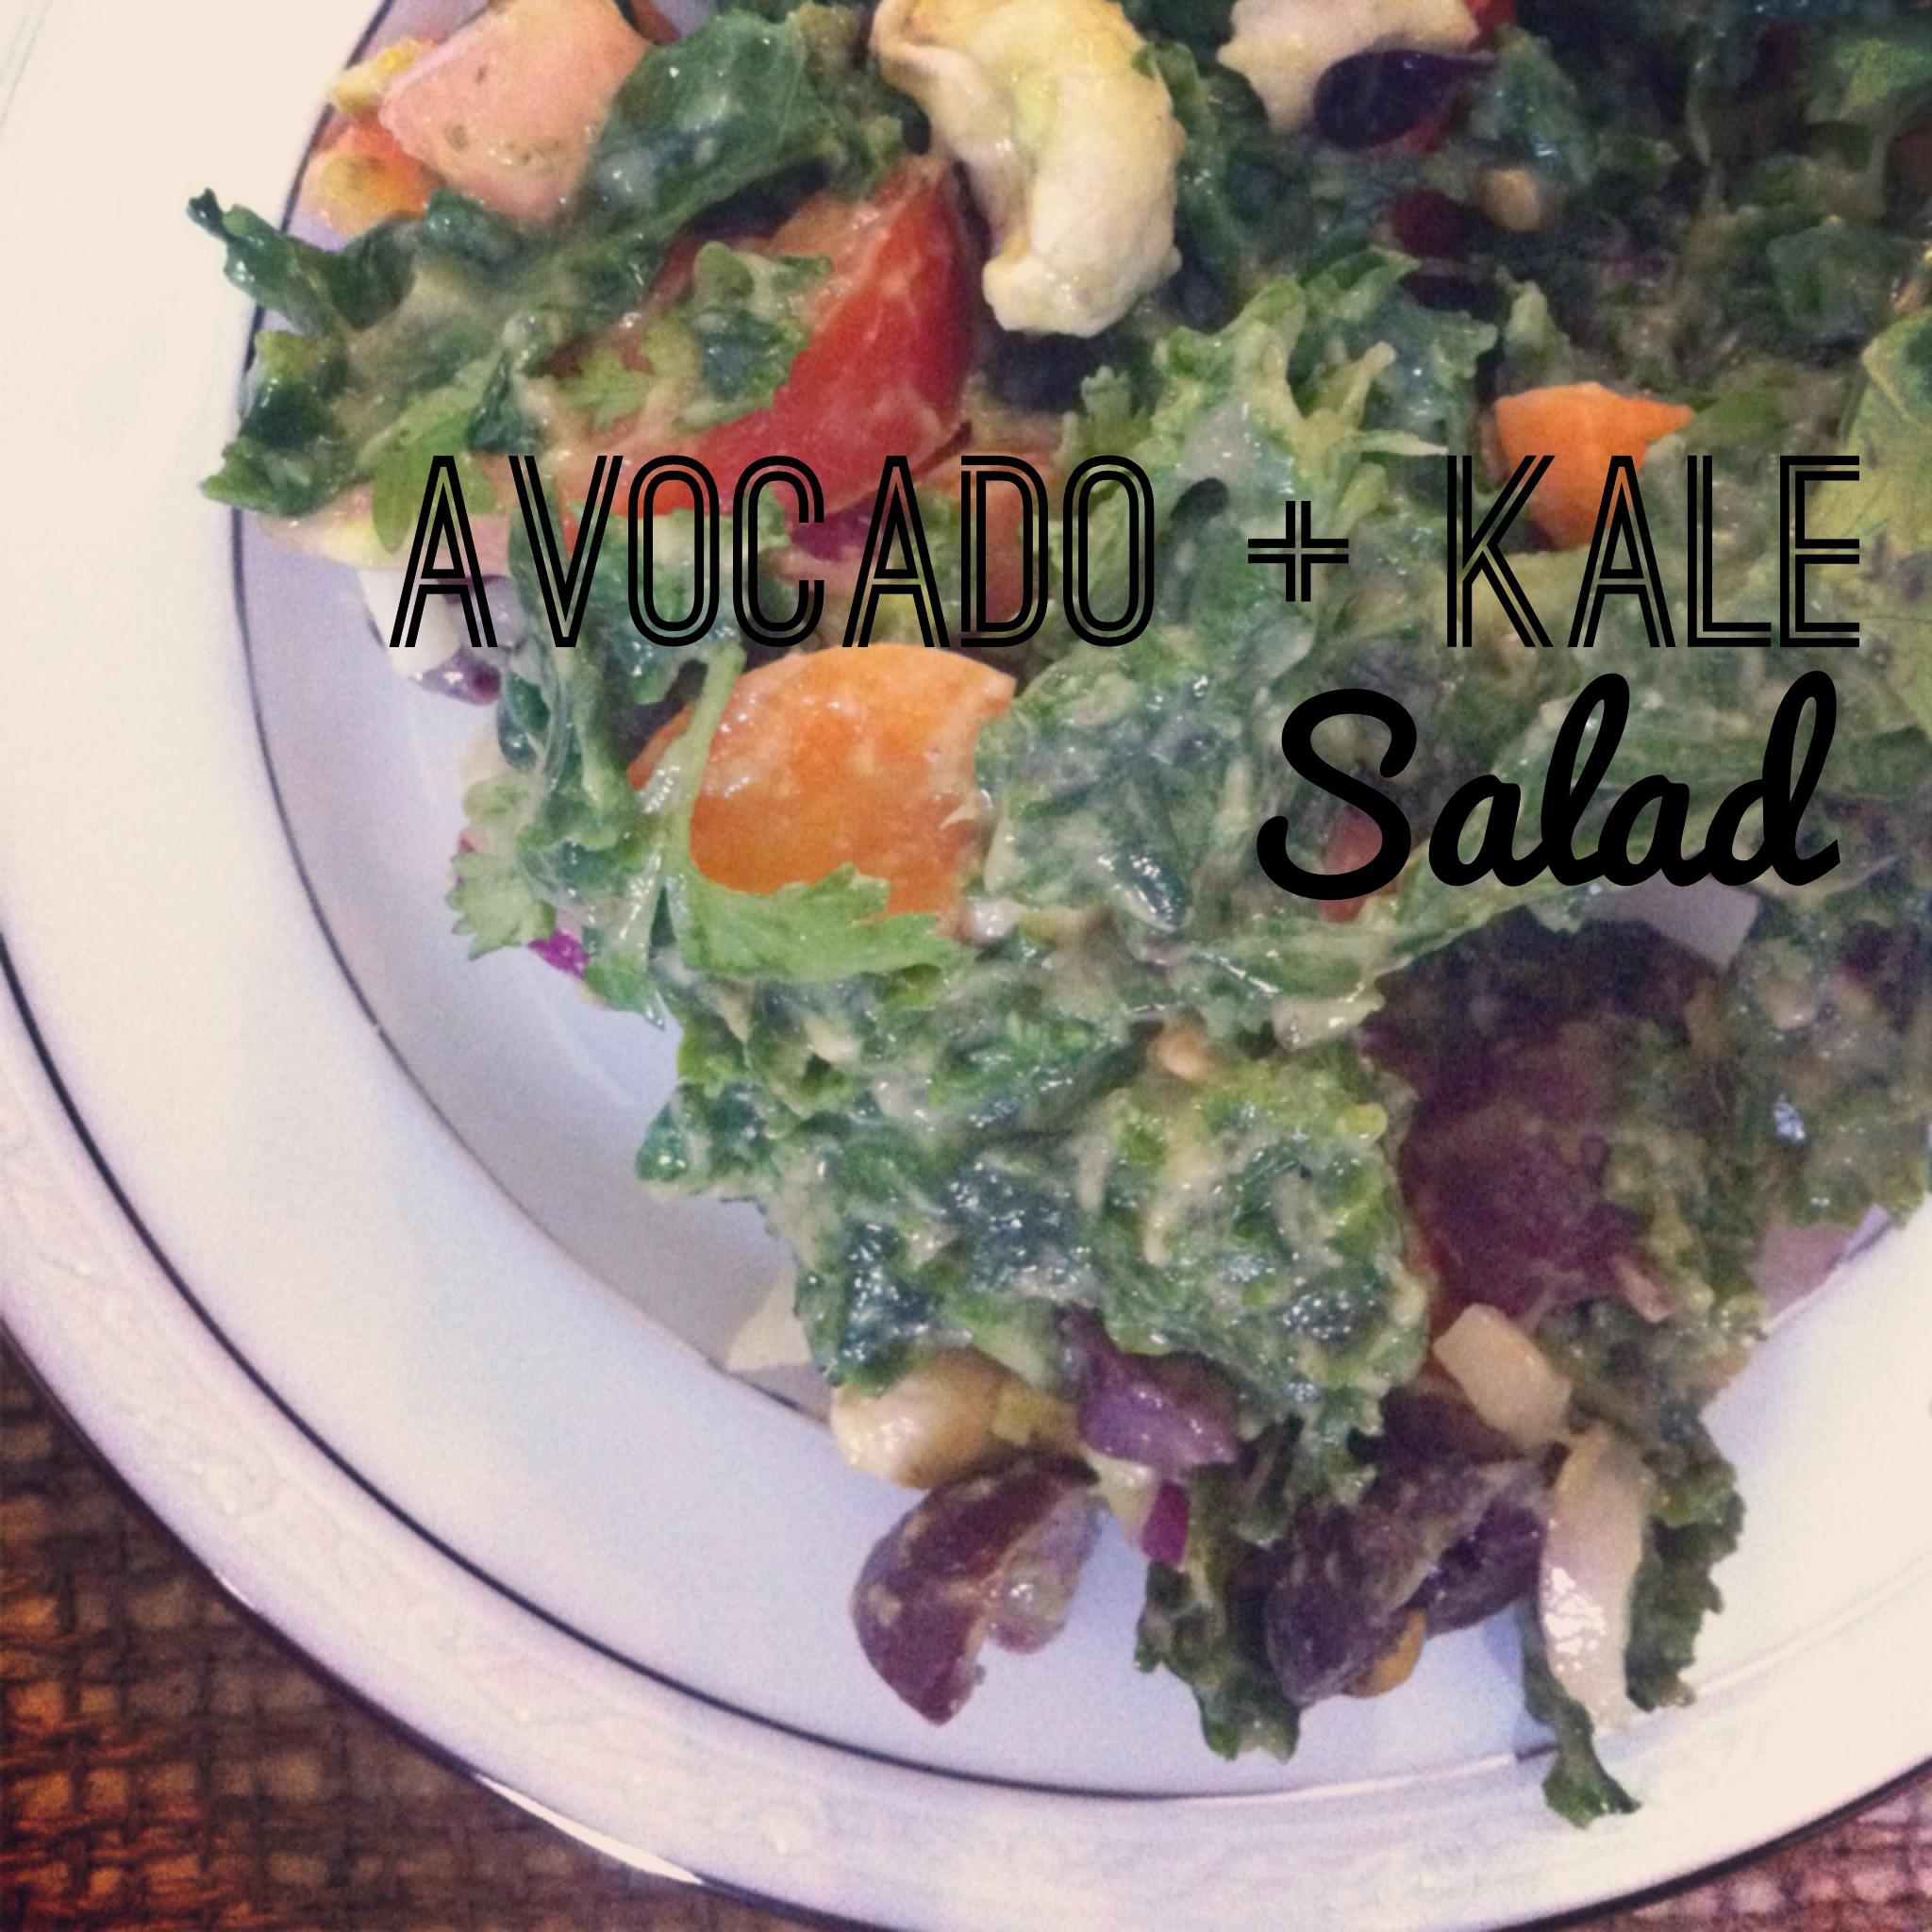 avocado-kale-salad-lacy-young